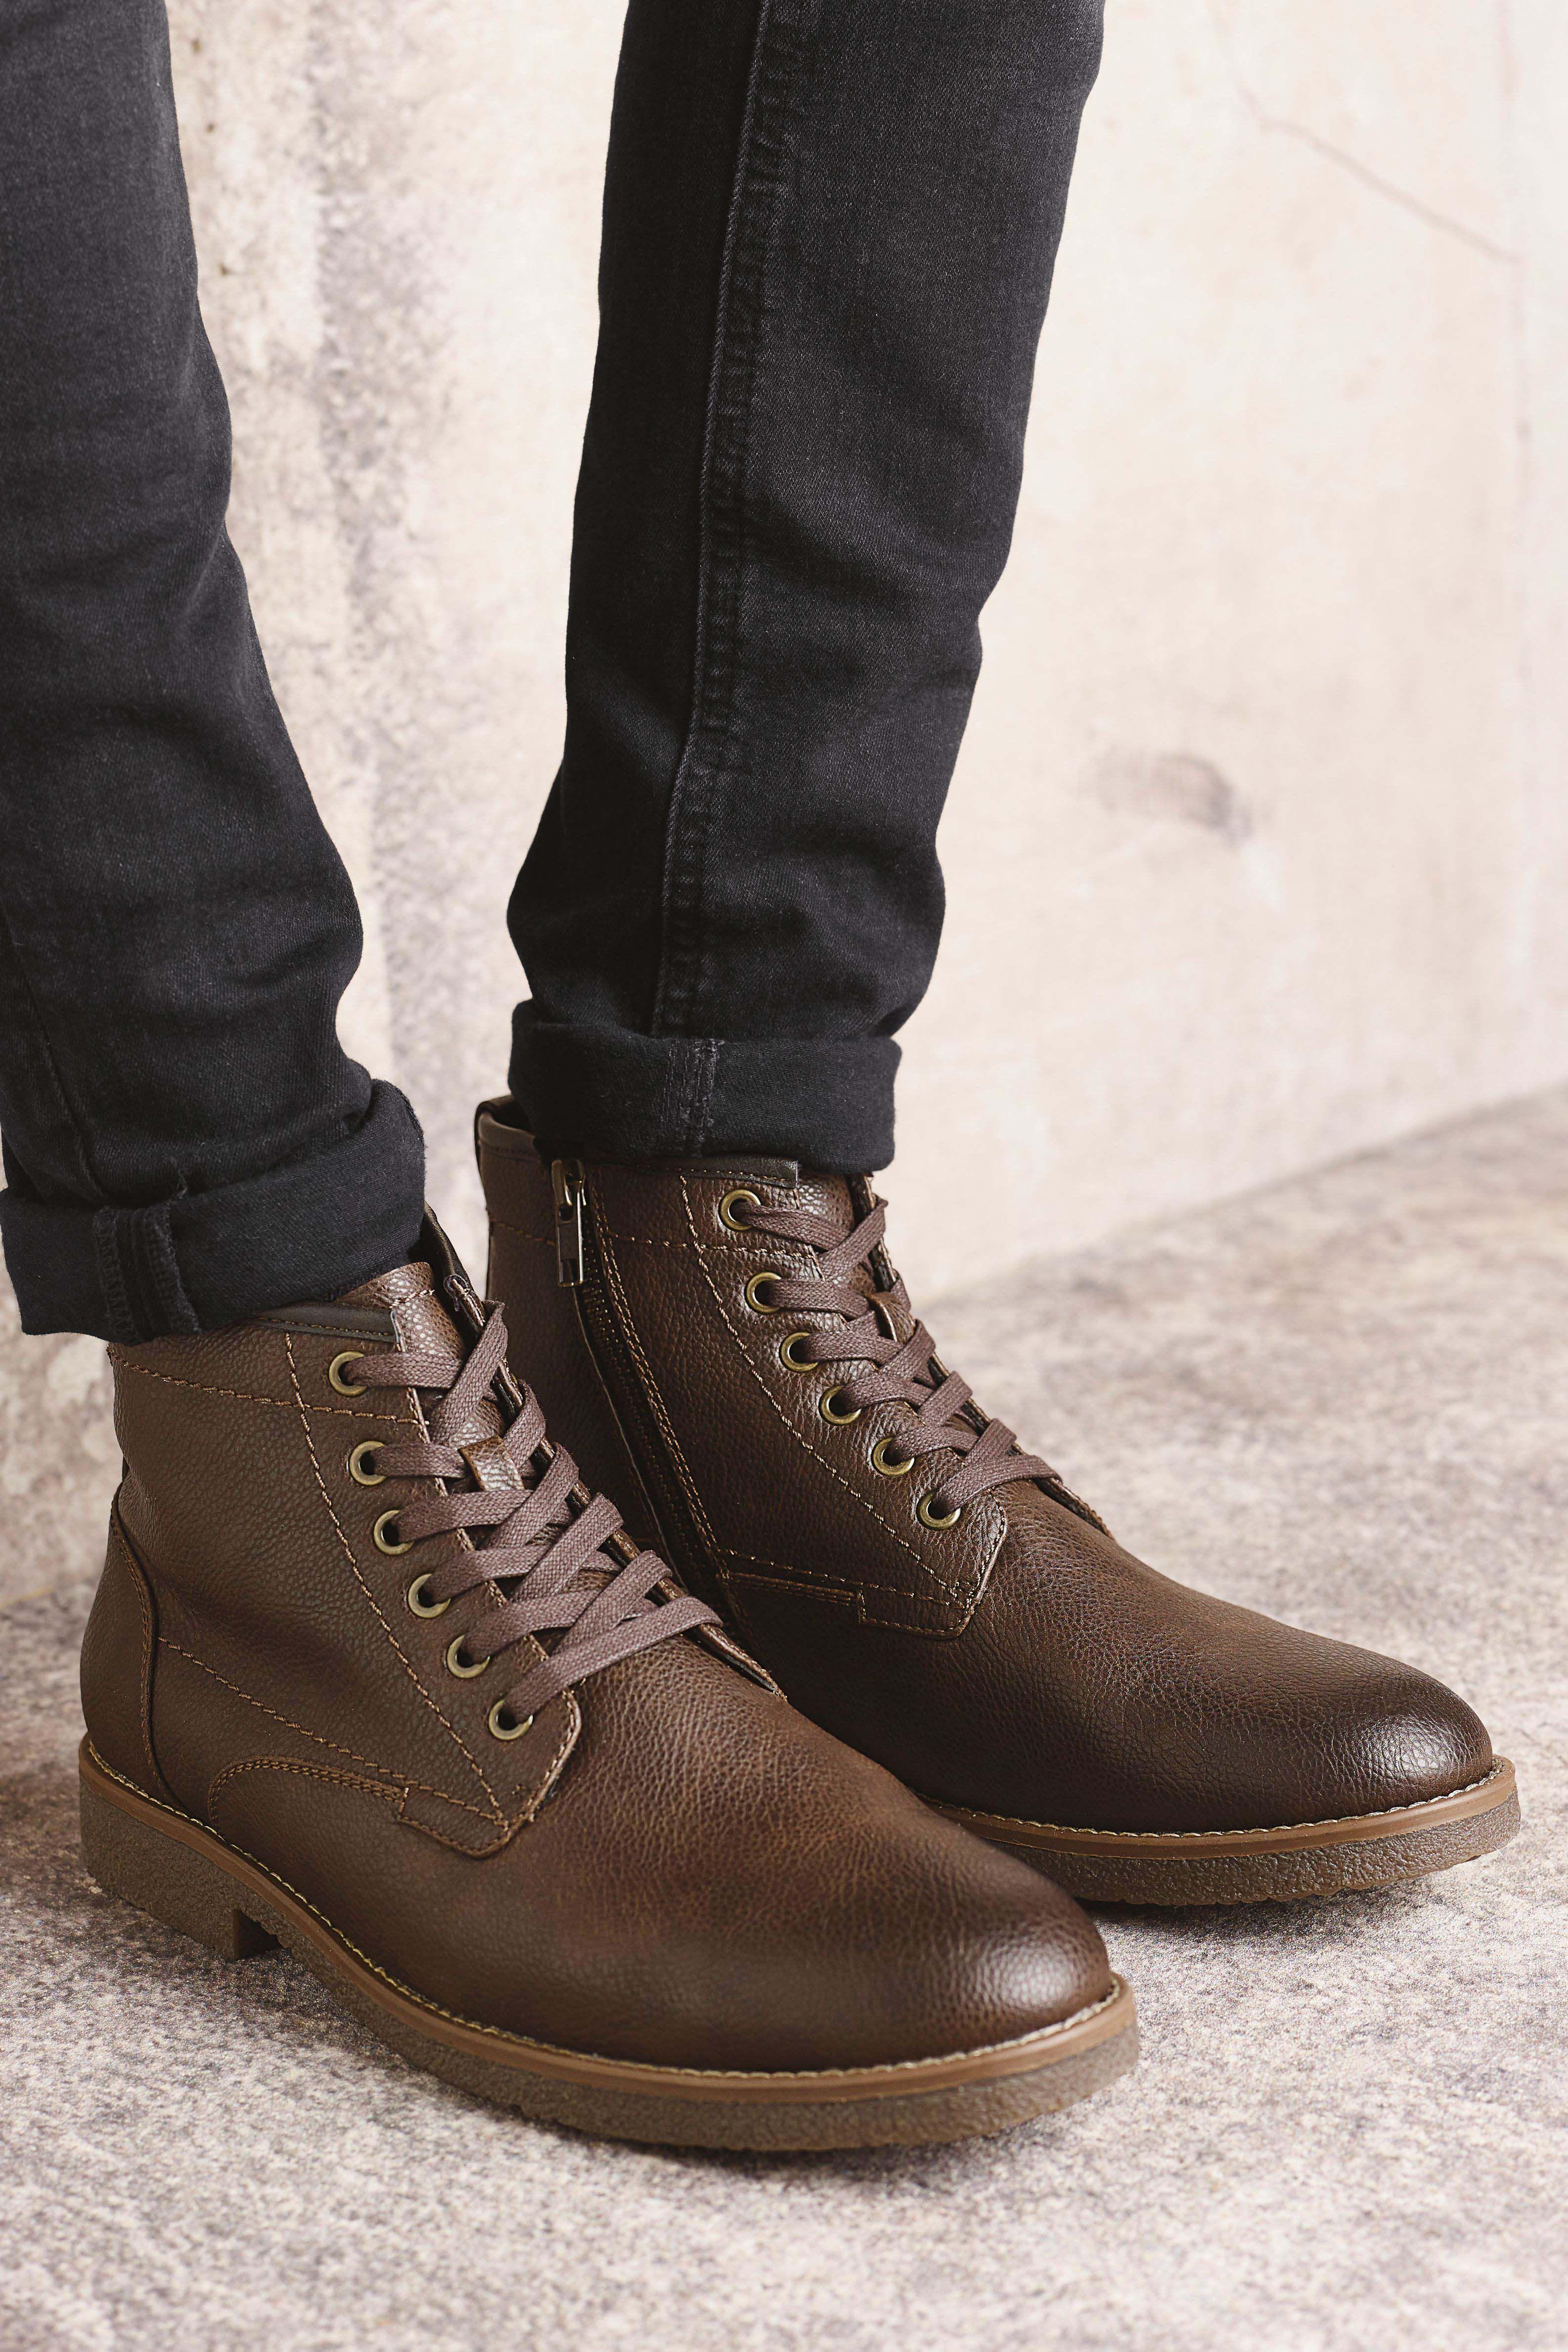 Brown boots, Boots, Dress shoes men